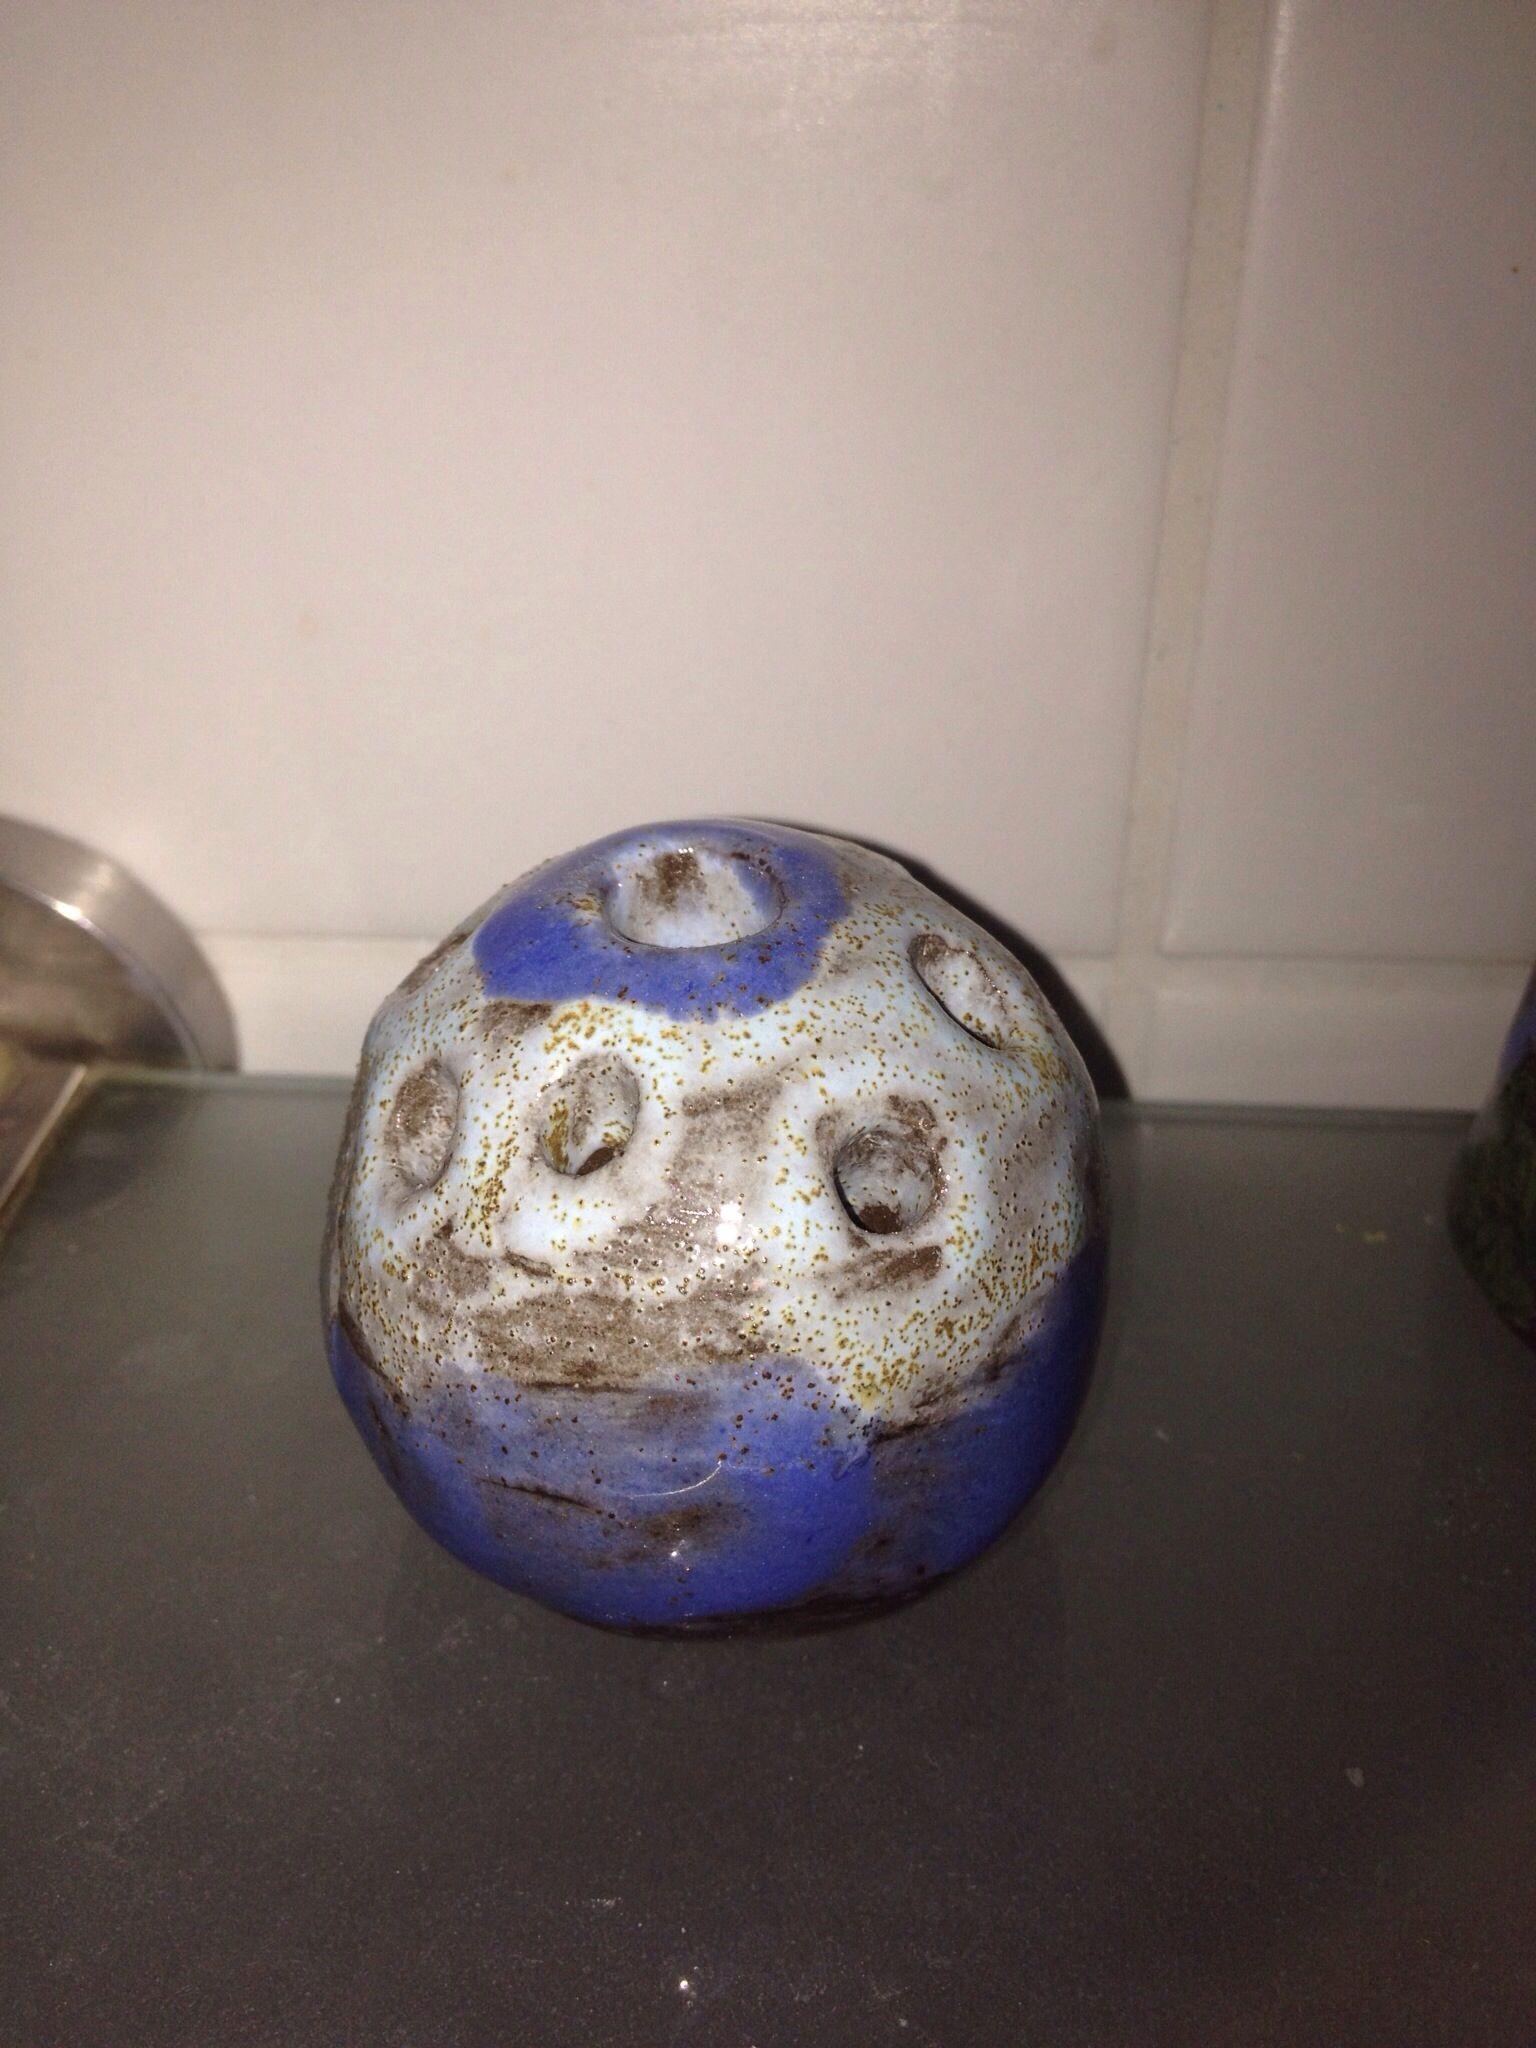 Vase Fruhjahr 2013 Keramik Ceramic Ton Getopfert Pottery Vase Keramik Fruhjahr